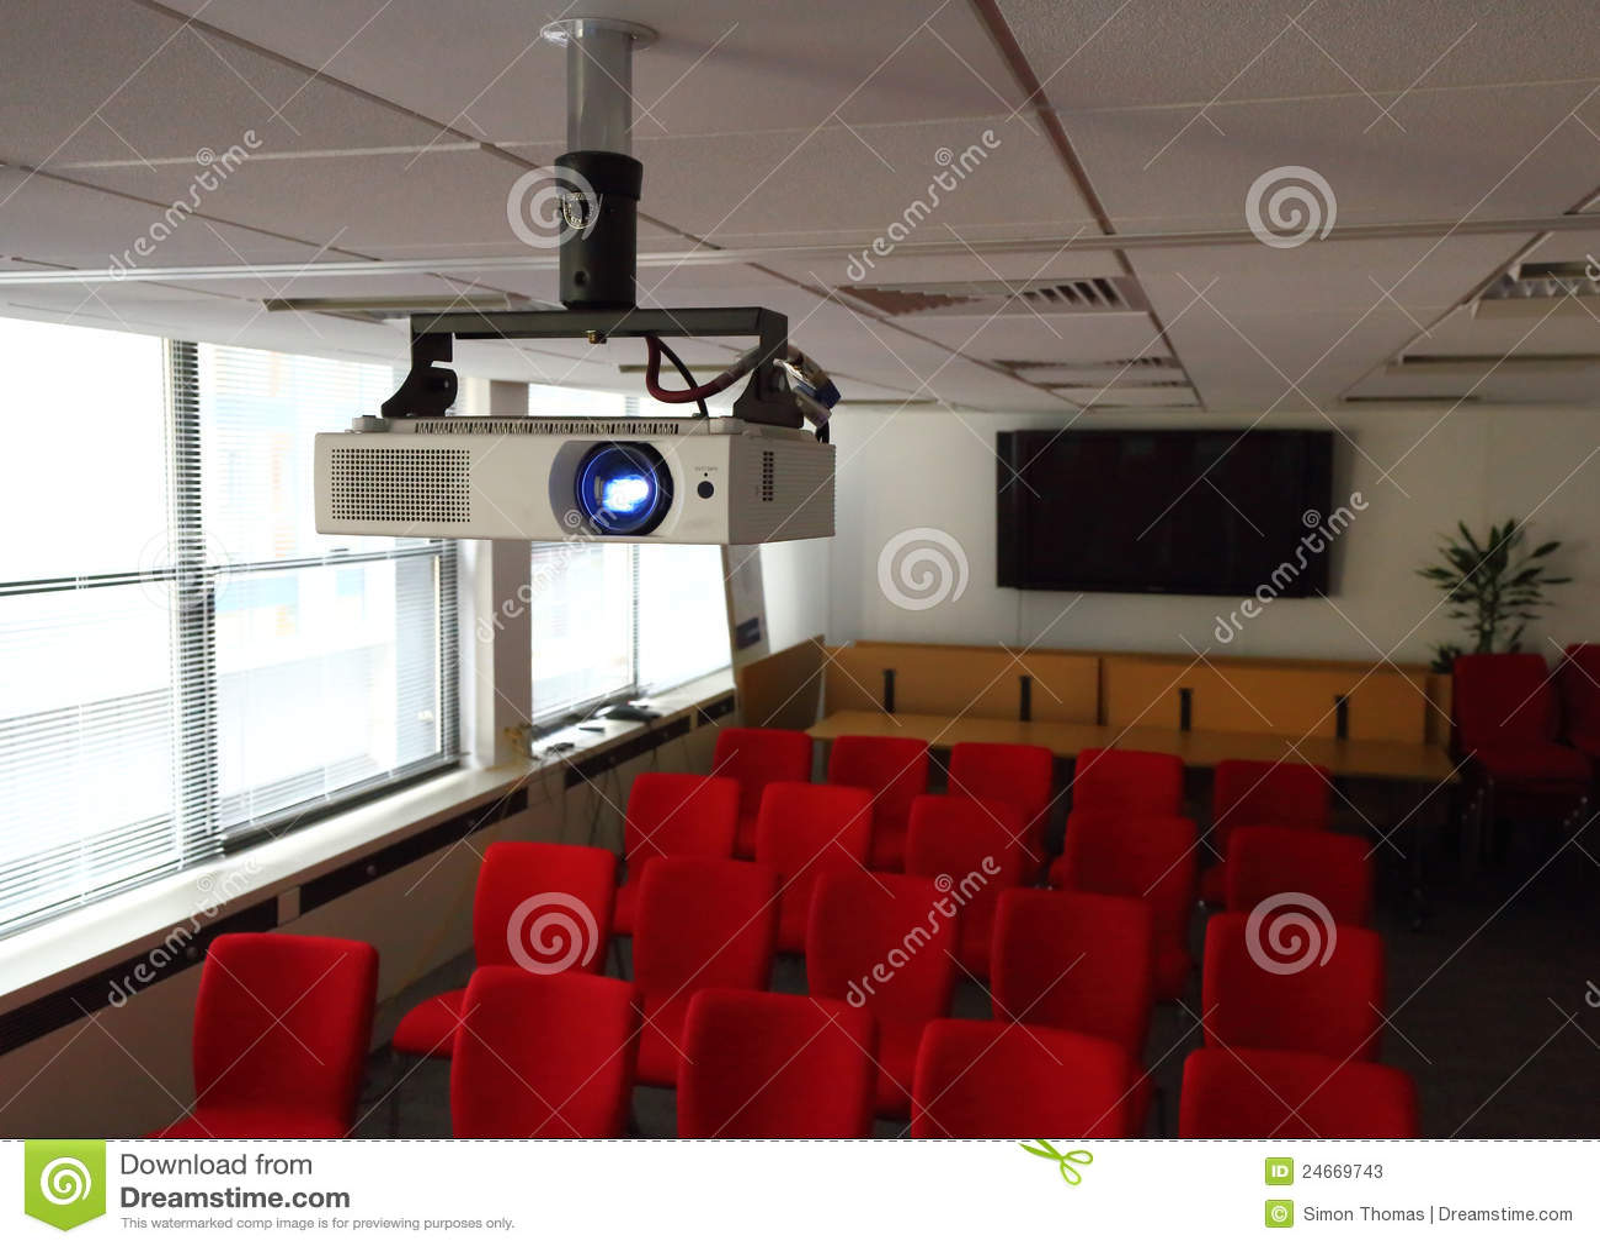 Projektor im Konferenzsaal